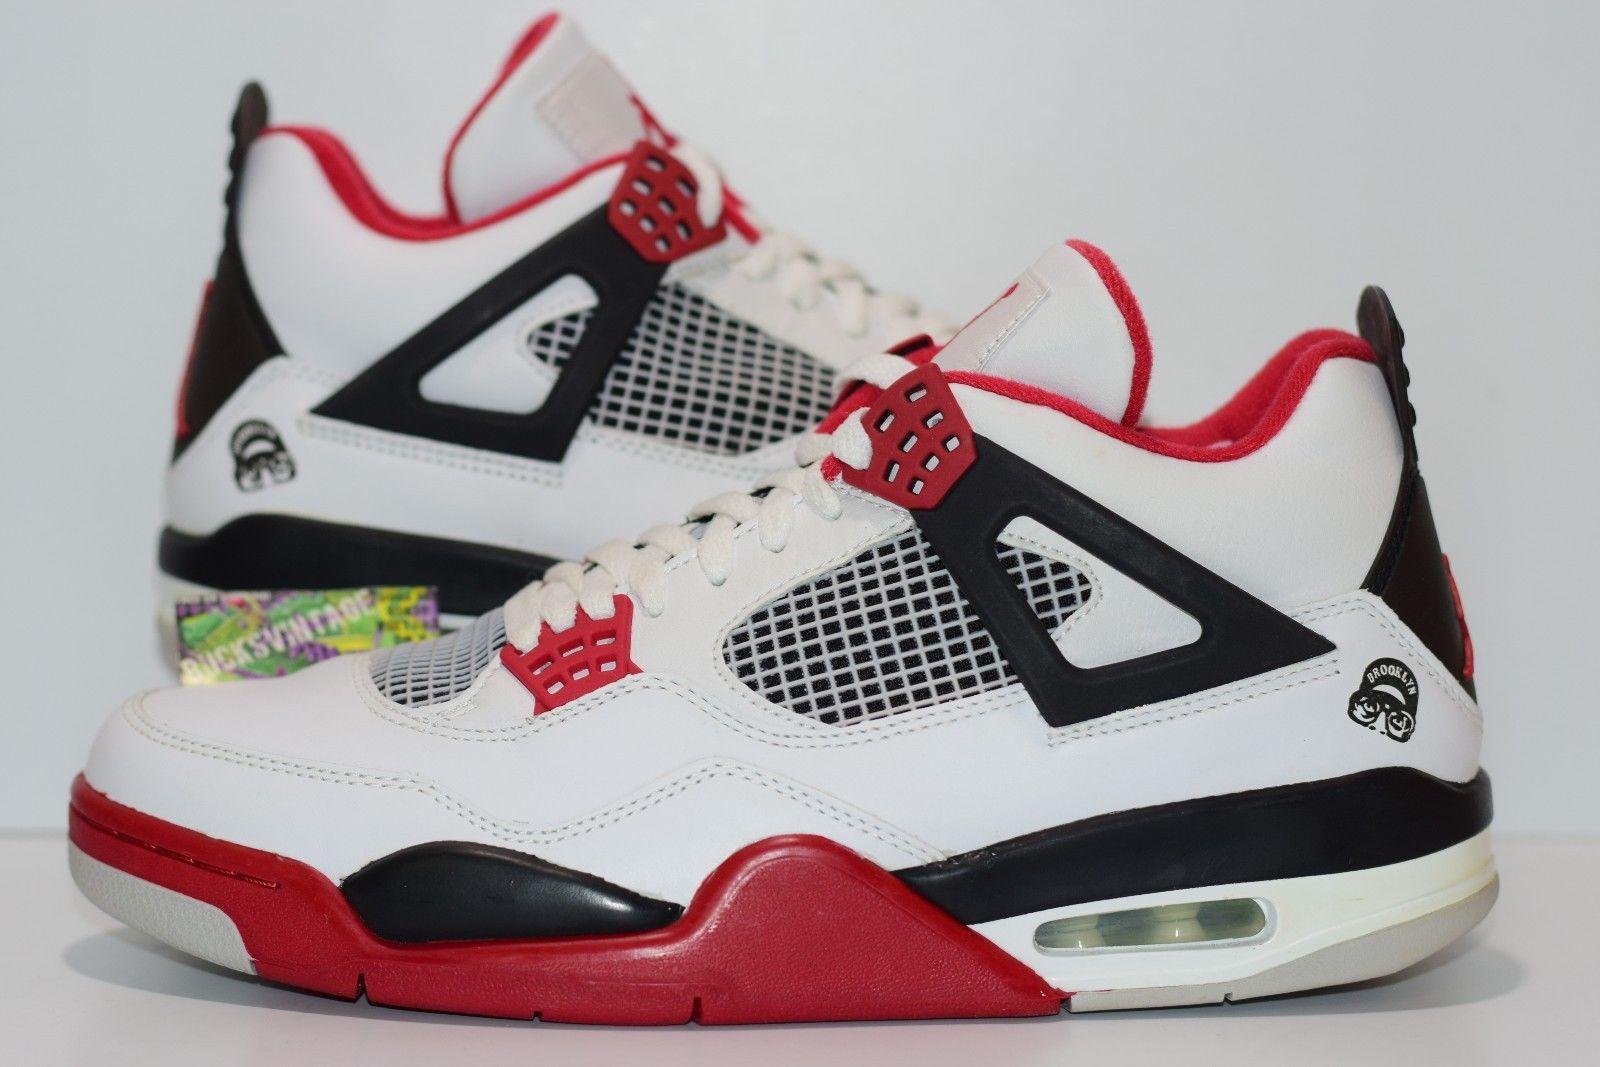 new product 7d895 7d96f Size 10   2006 Nike Air Jordan IV Mars Blackmon Spike Lee